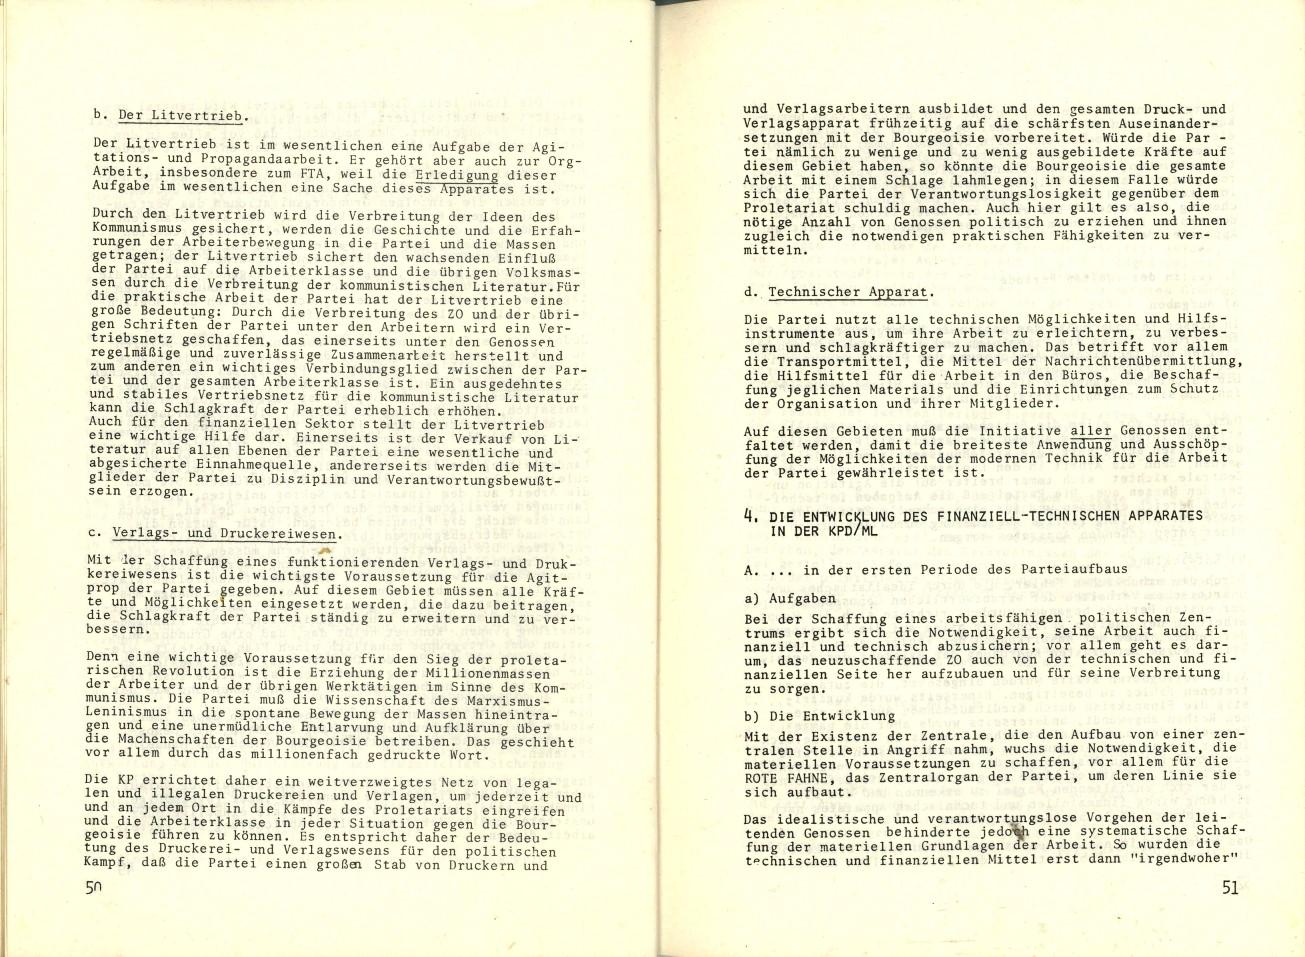 ZB_Parteiarbeiter_1971_06_27